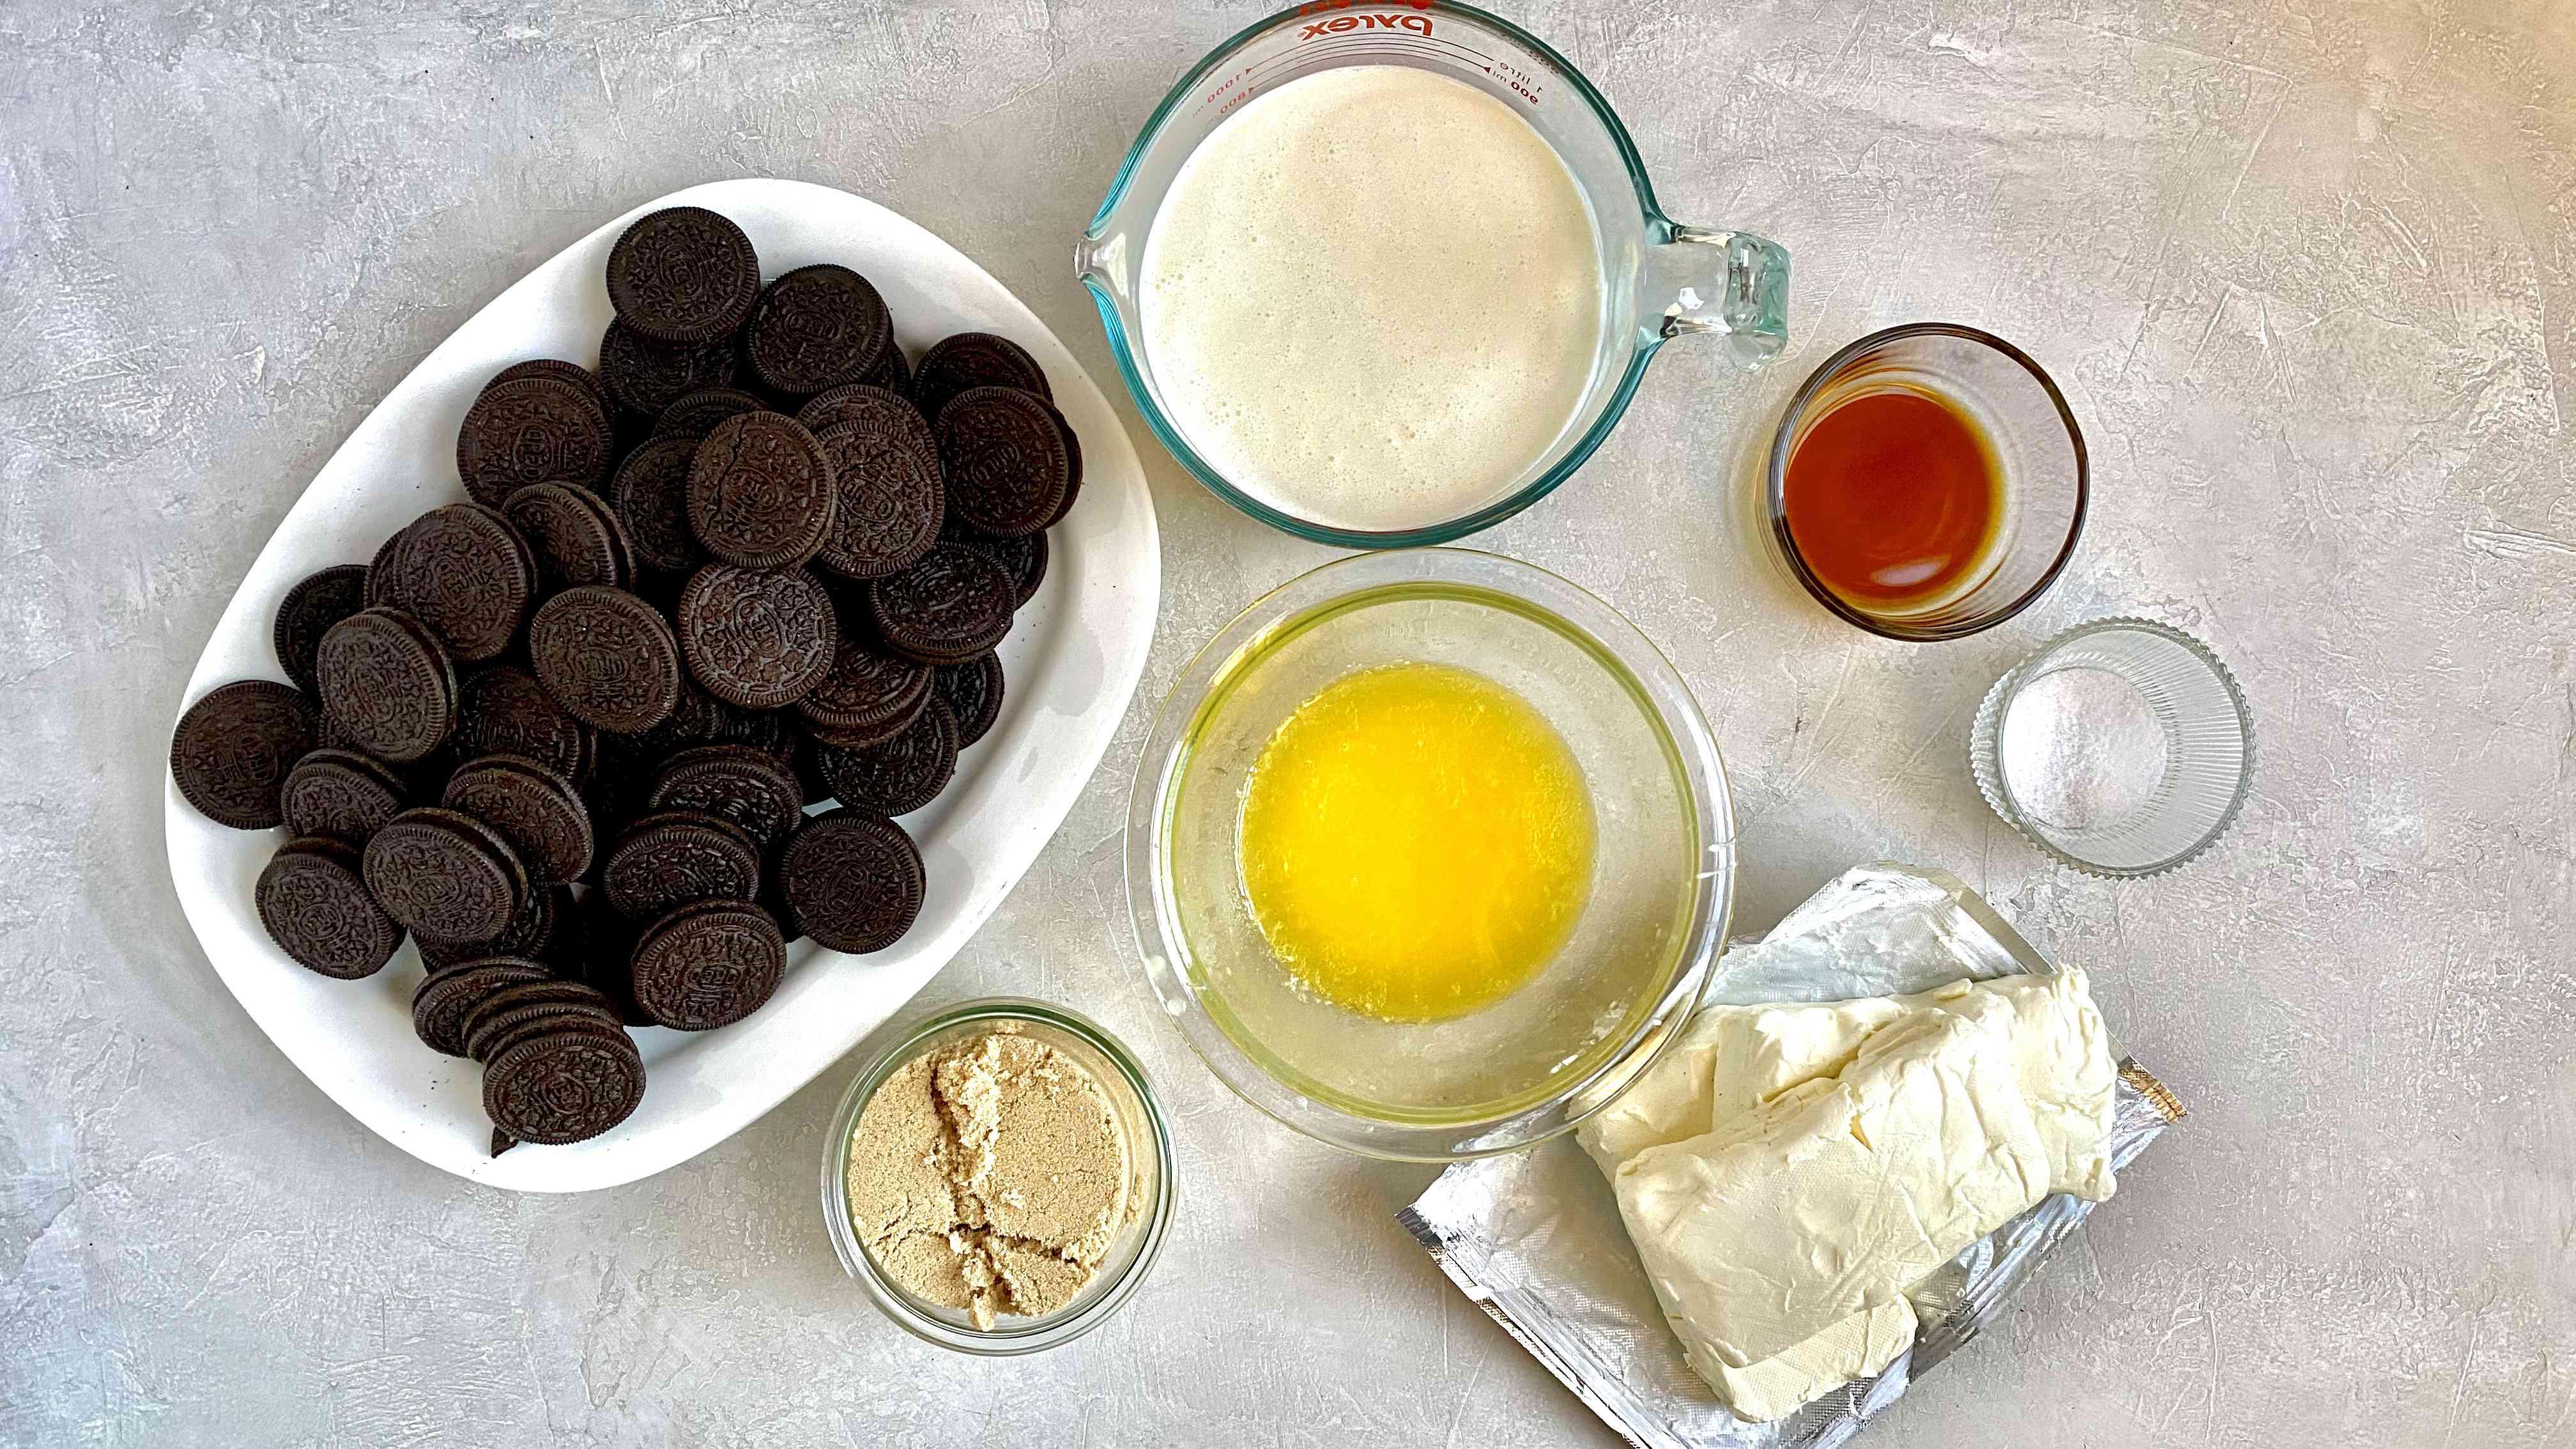 Ingredients for no-bake Oreo cheesecake